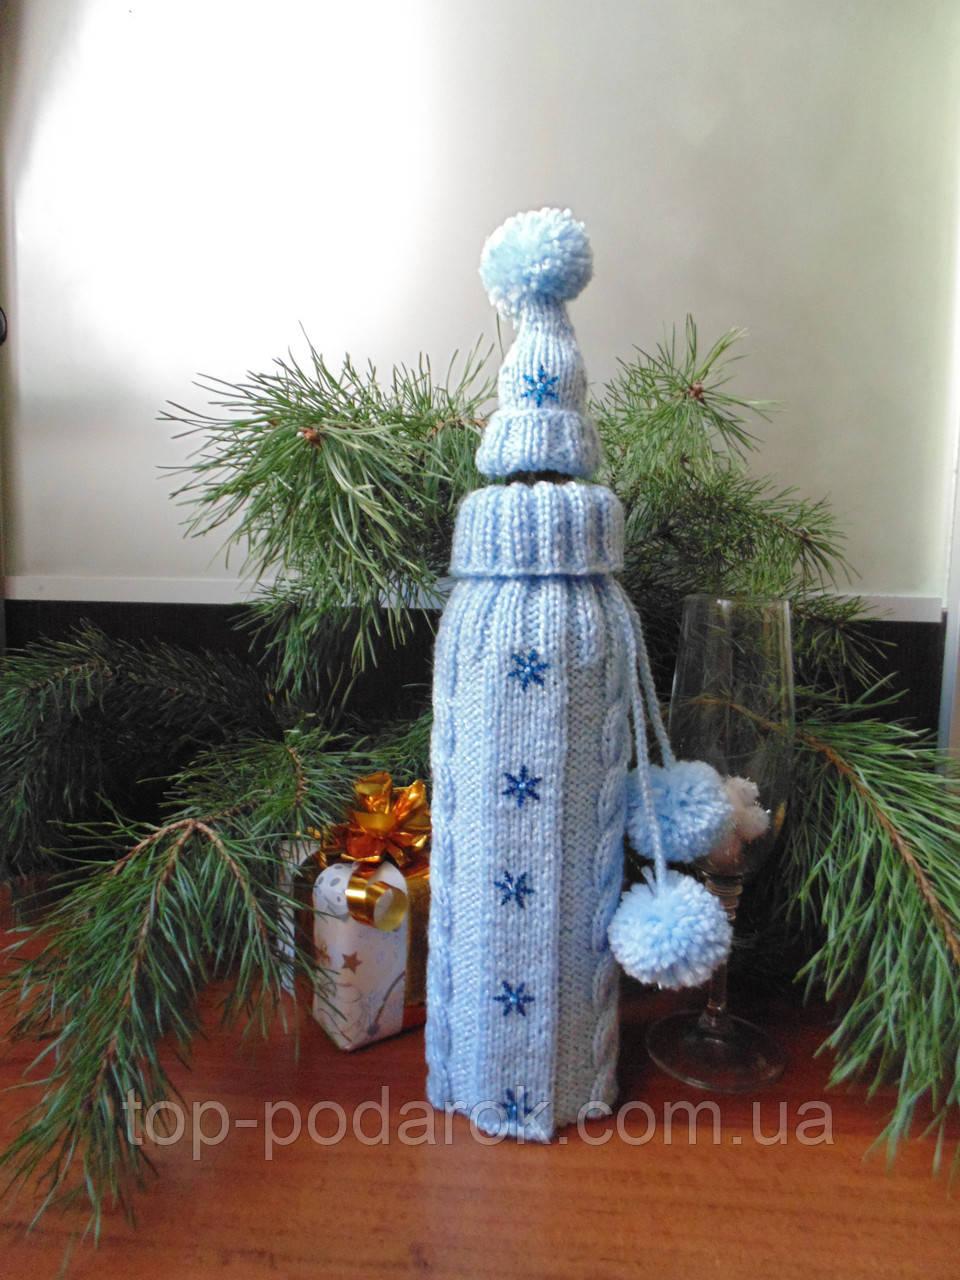 Новорічна прикраса на пляшку свитр і шапка Санта